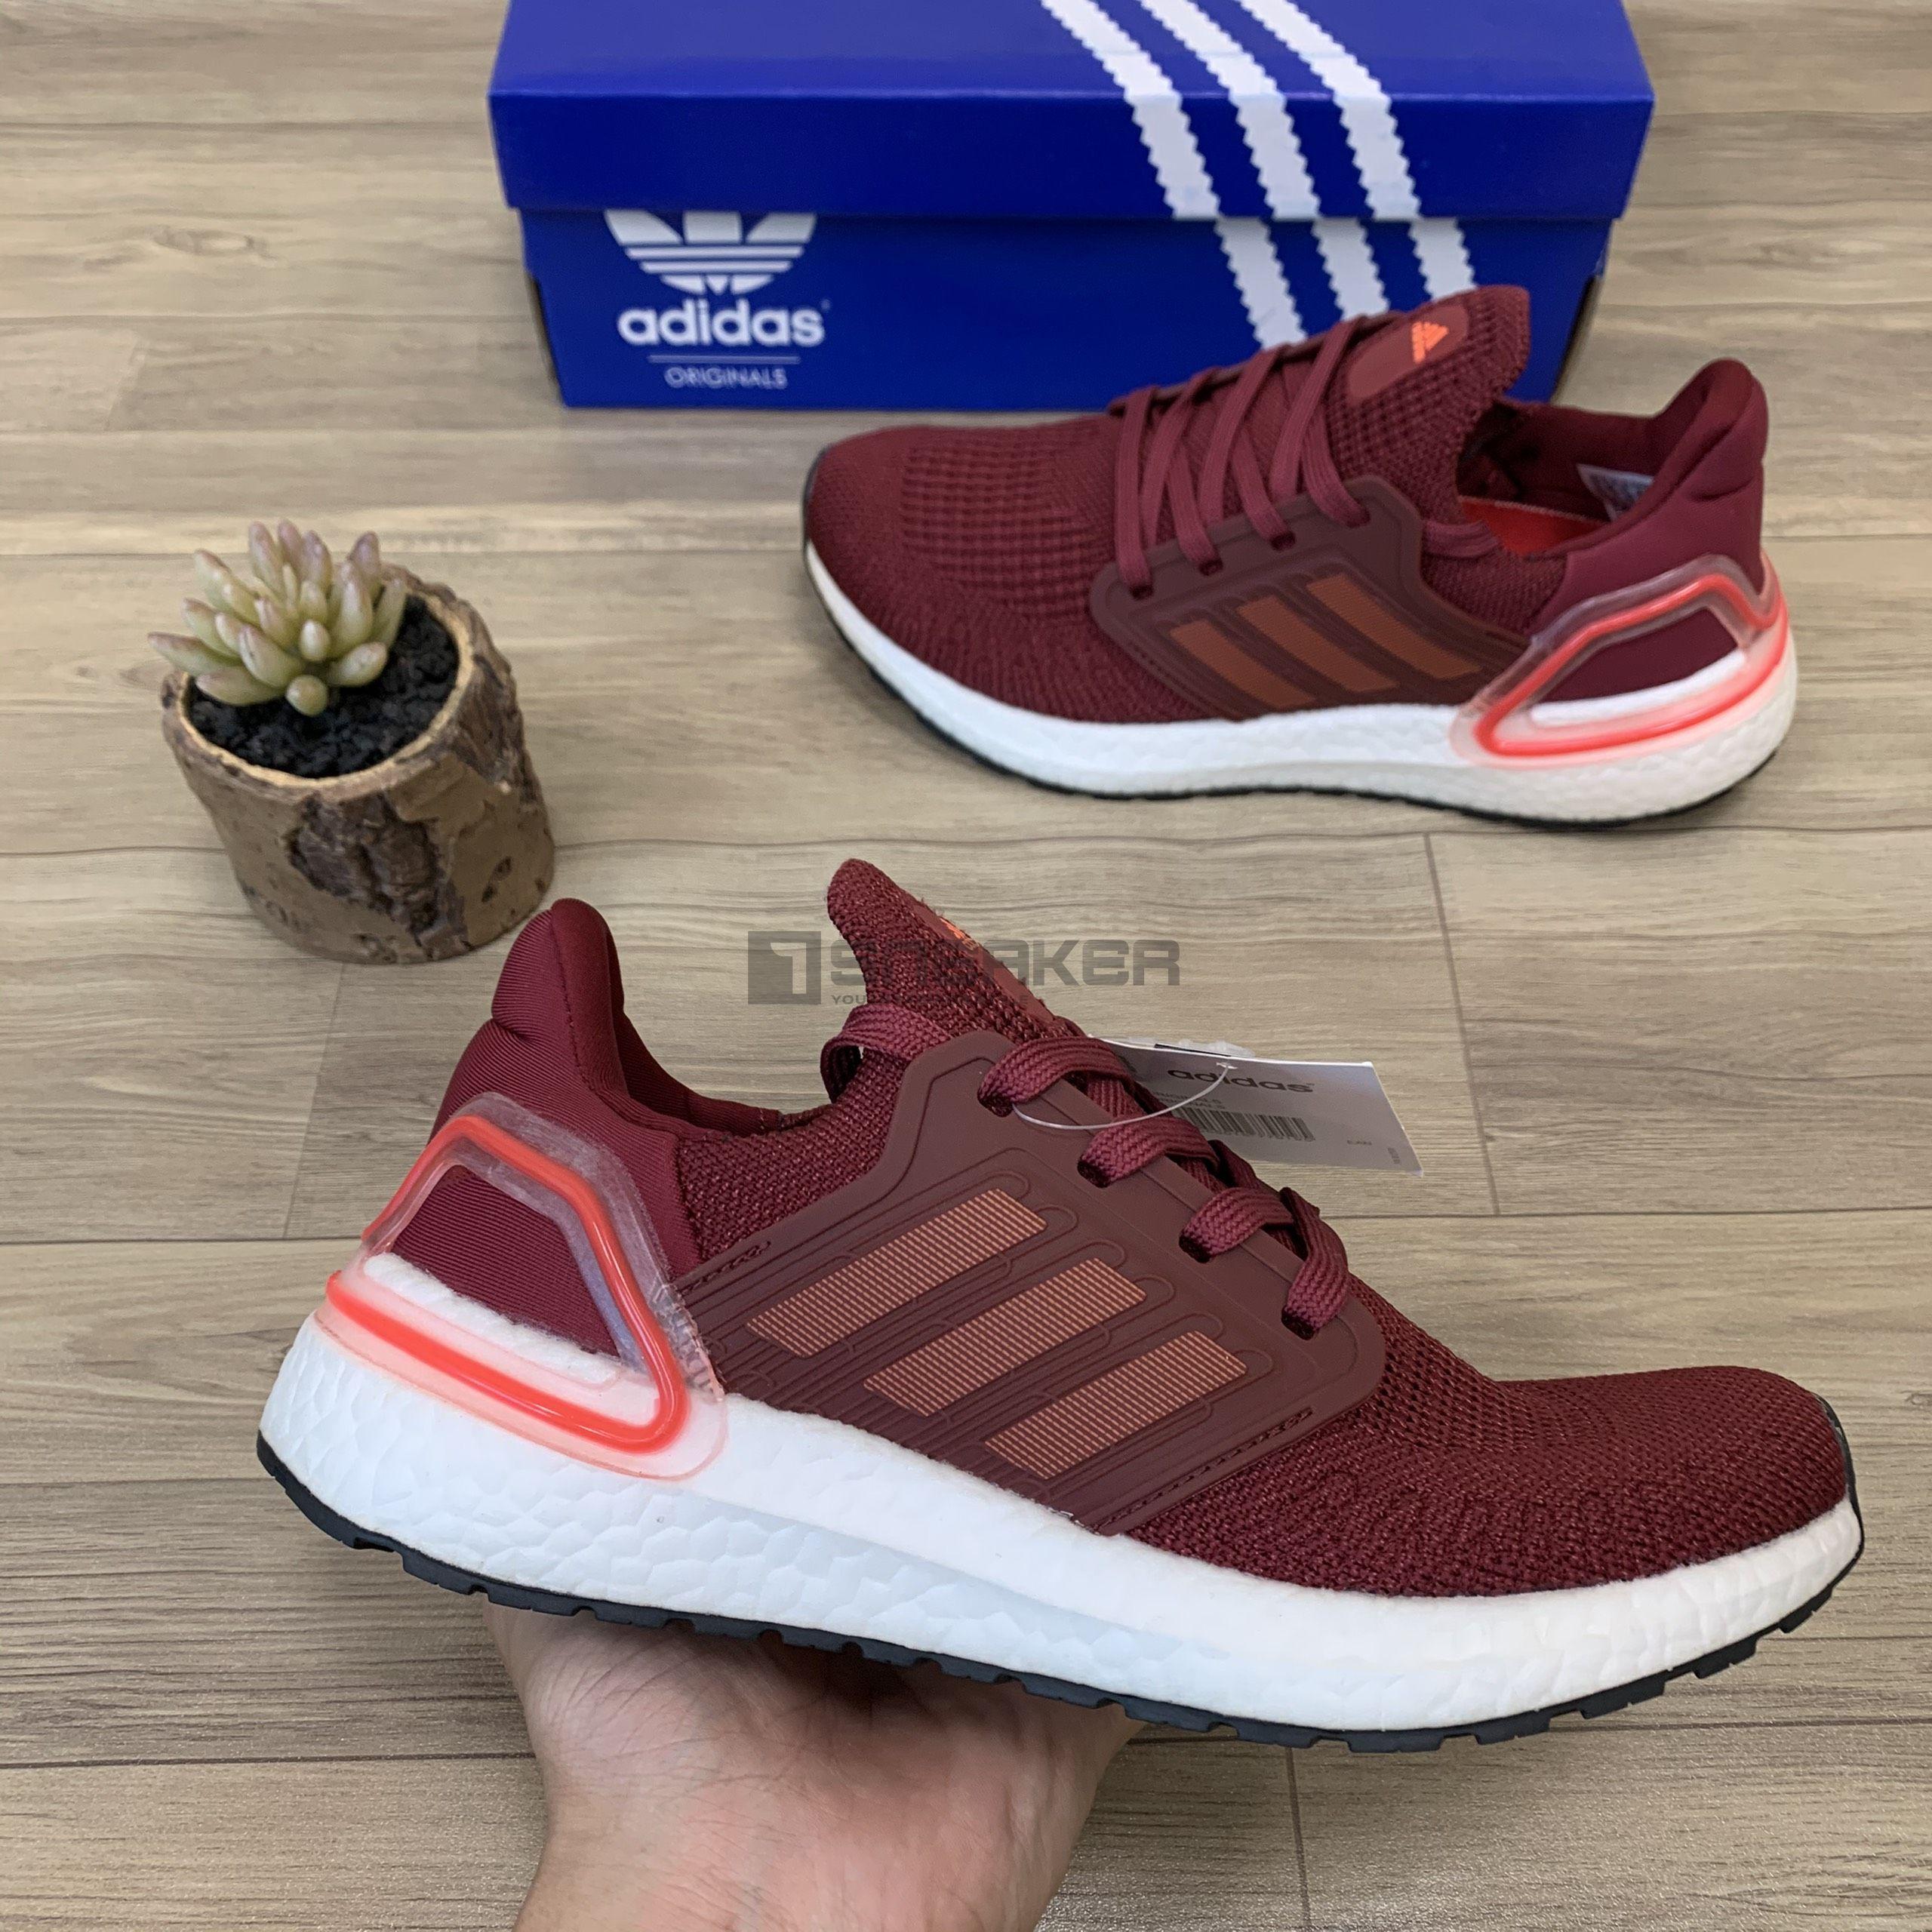 Giày Sneaker Ultraboost 6.0 đỏ mận giá rẻ